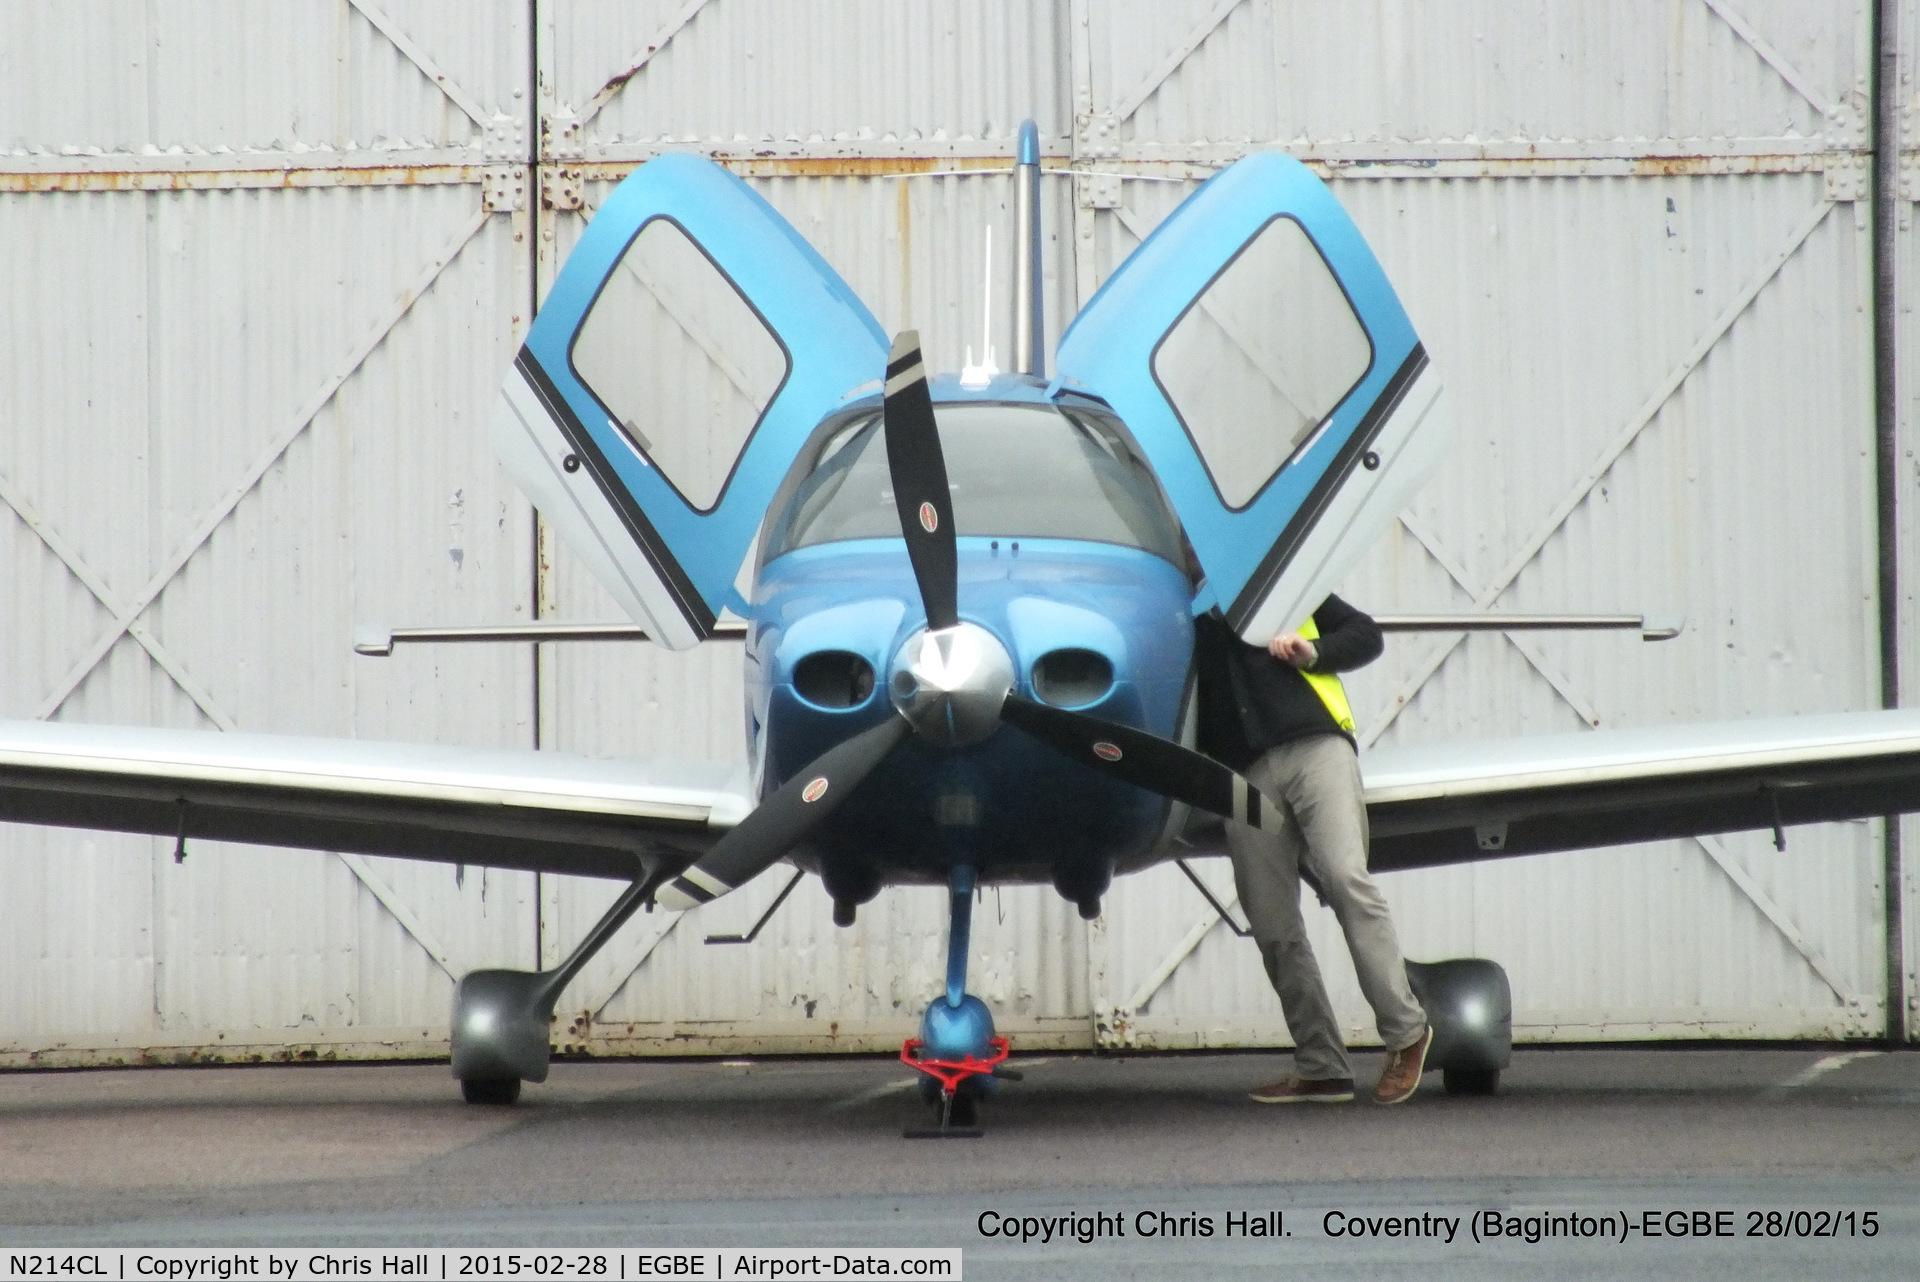 N214CL, 2012 Cirrus SR22 GTS C/N 3830, Birt Aviation